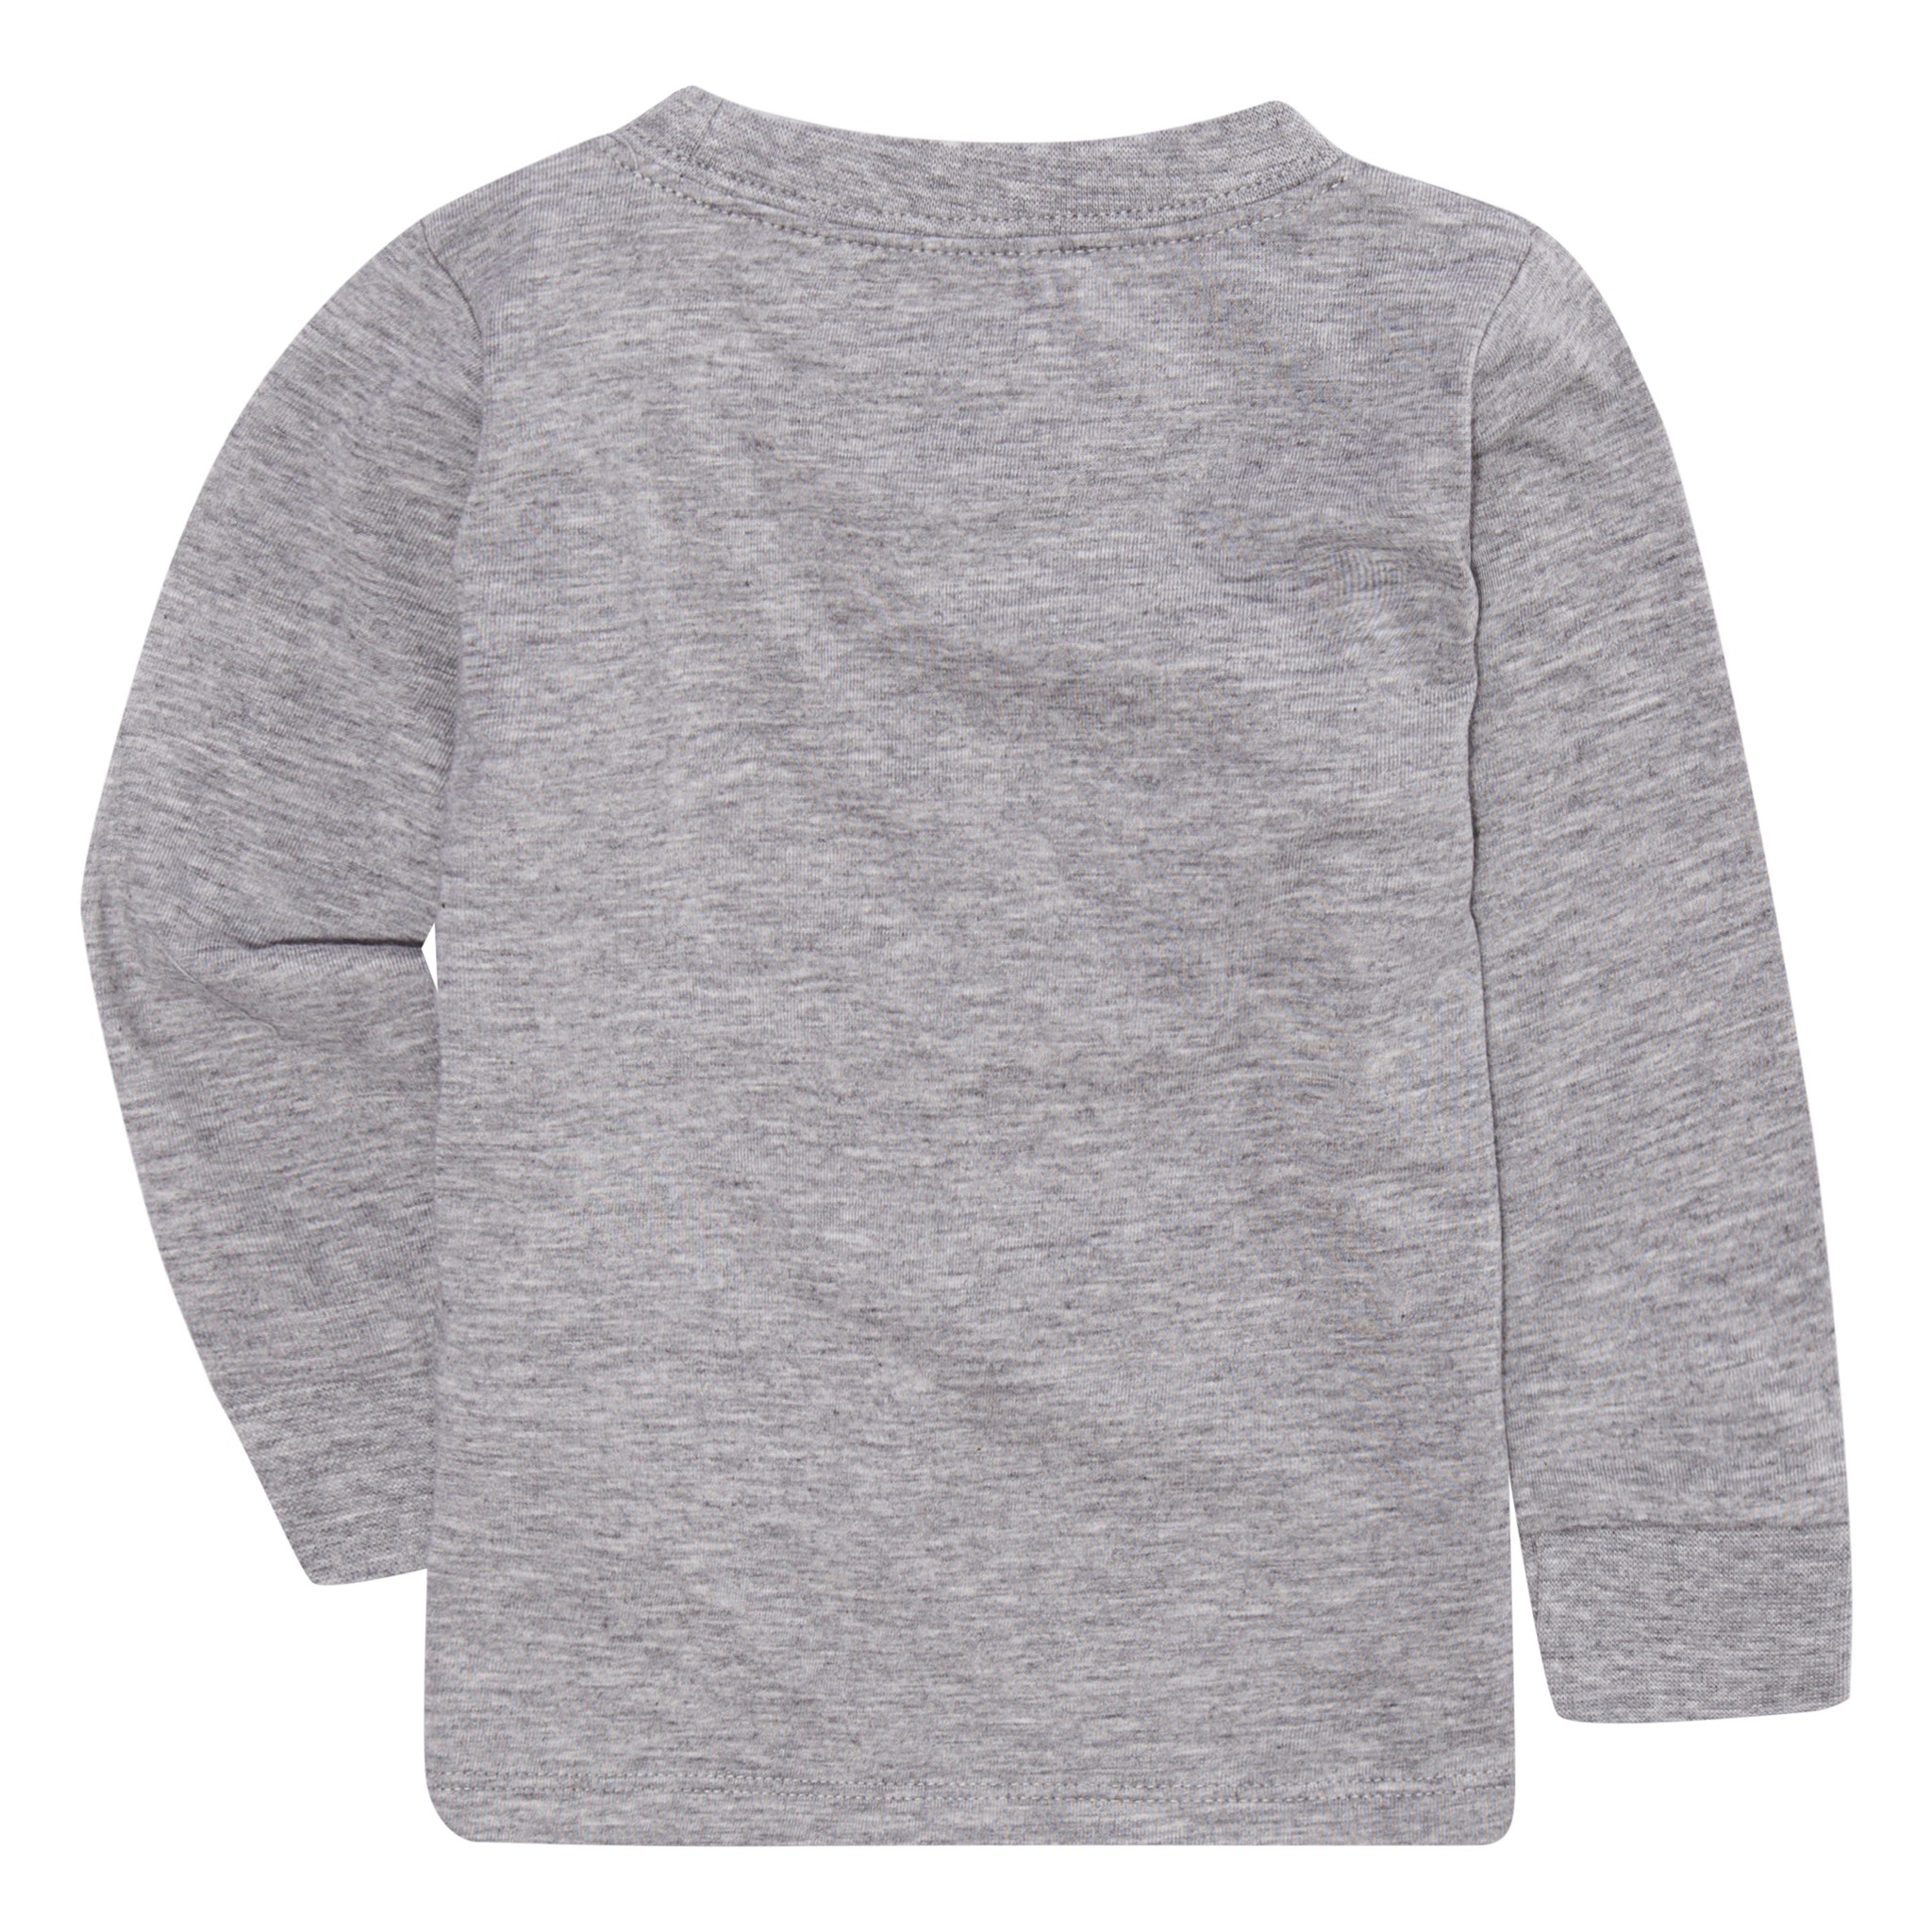 Levi's T-shirt longsleeve batwing grey heather